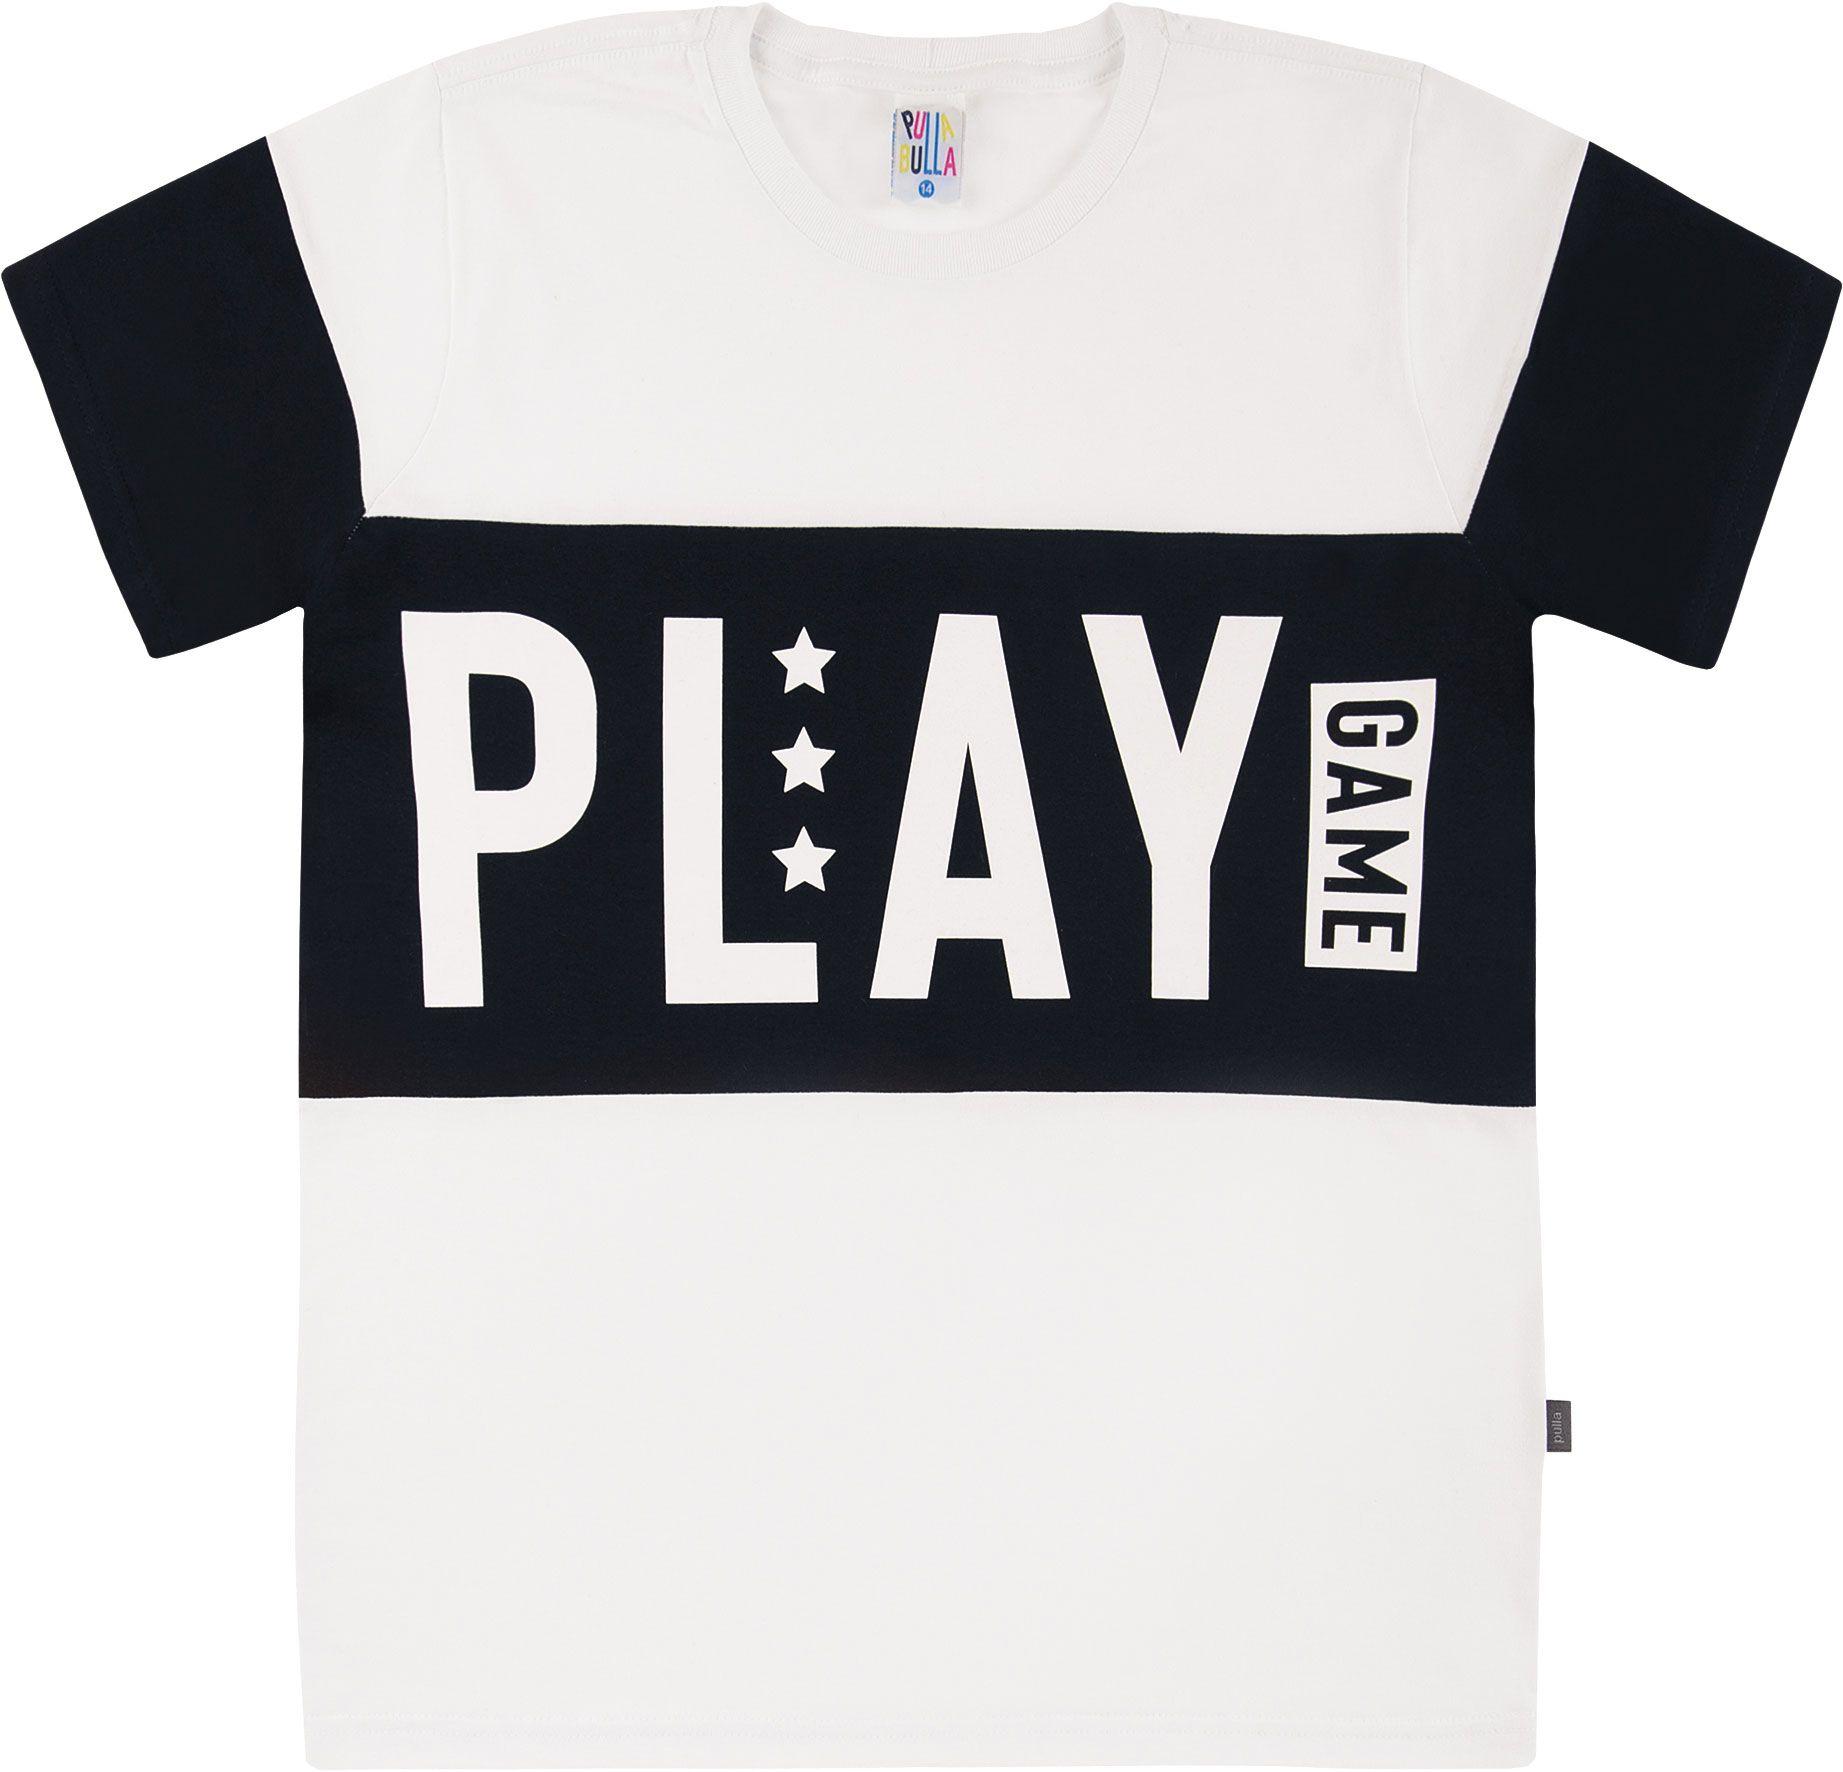 Camiseta Pulla Bulla Play Branco